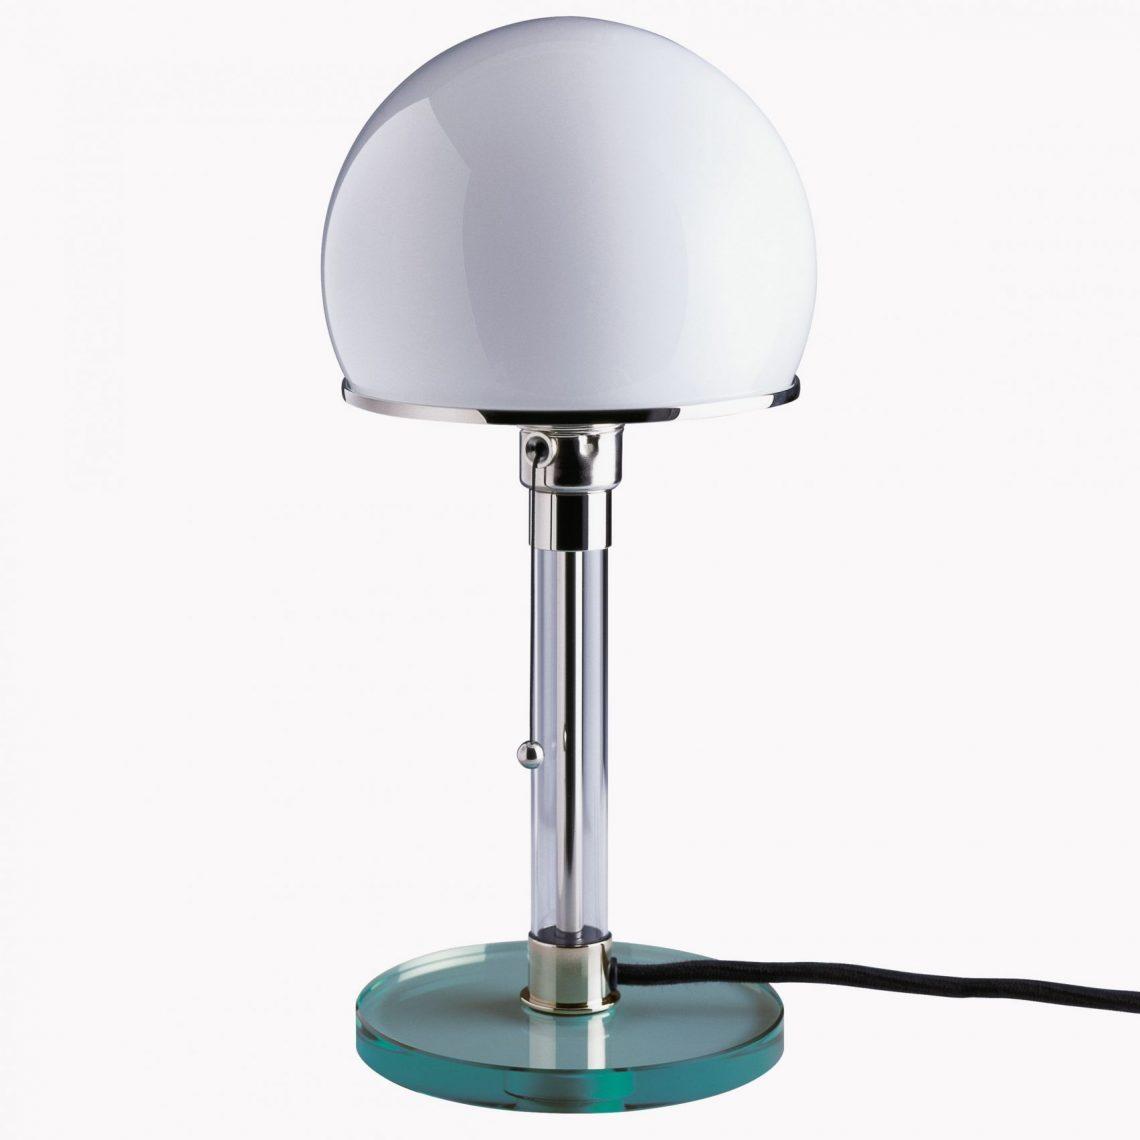 Selected_Happy birthday Bauhaus_mt8 lamp